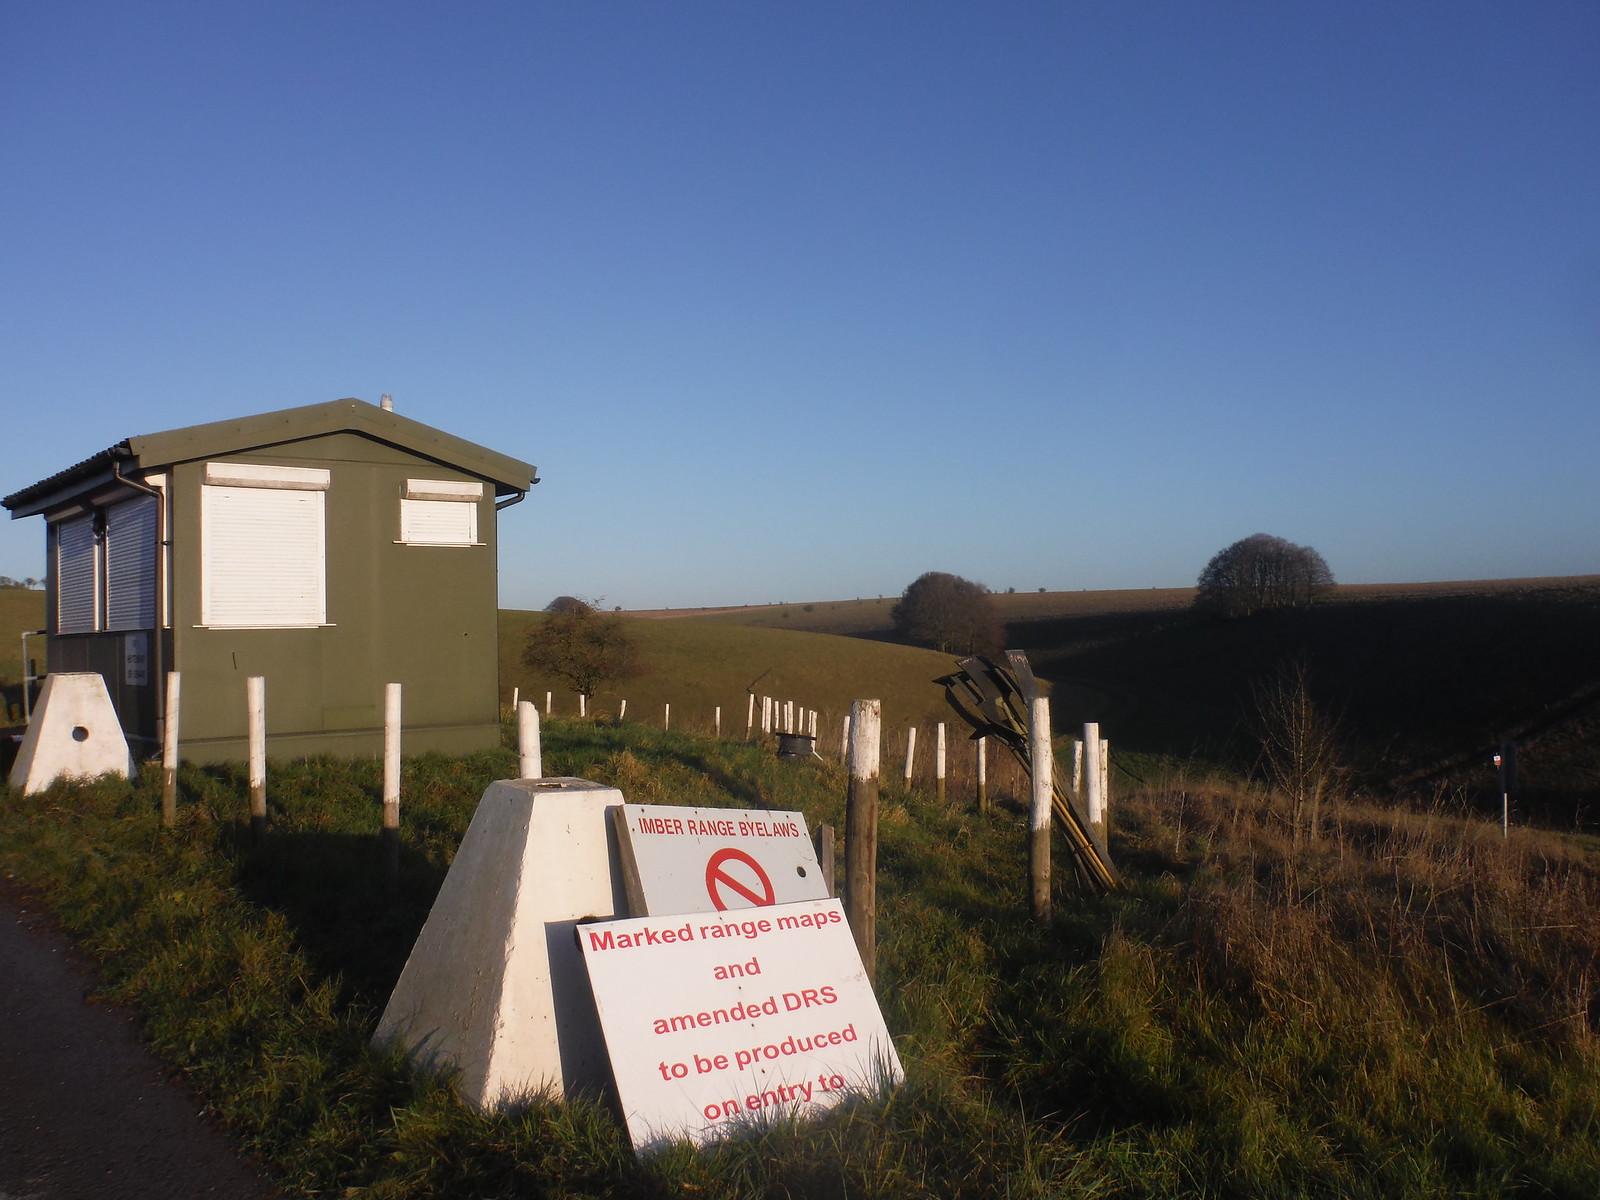 Imber Range, Heytesbury Vedette/Sentry Box SWC Walk 286 Westbury to Warminster (via Imber Range)